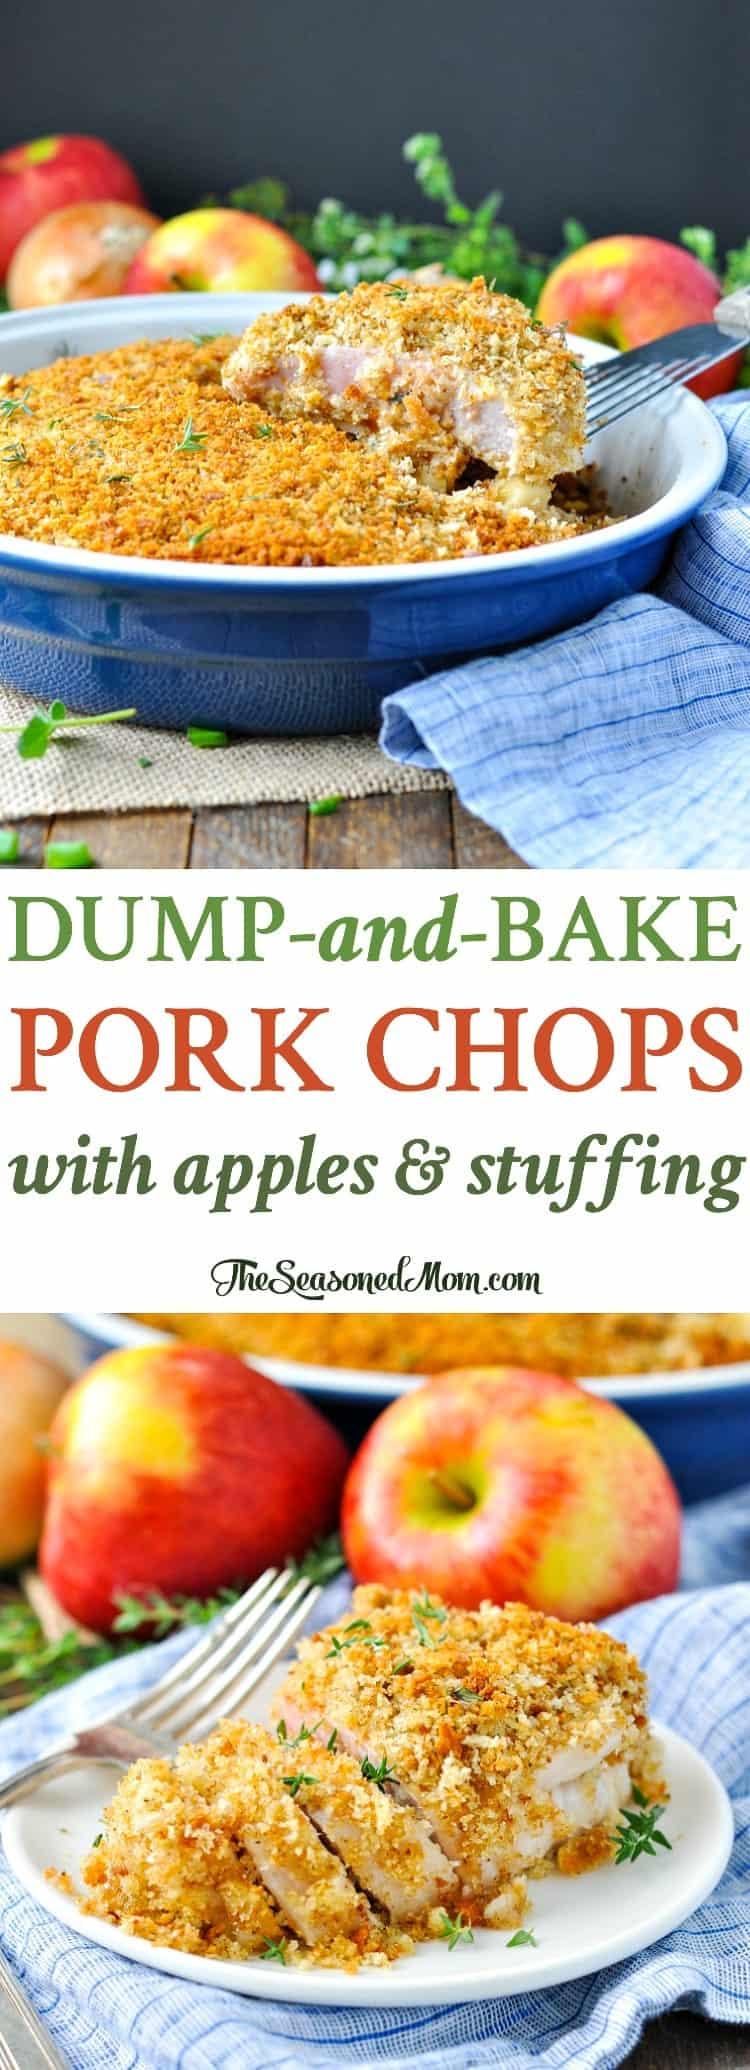 Dump-and-Bake Boneless Pork Chops - The Seasoned Mom